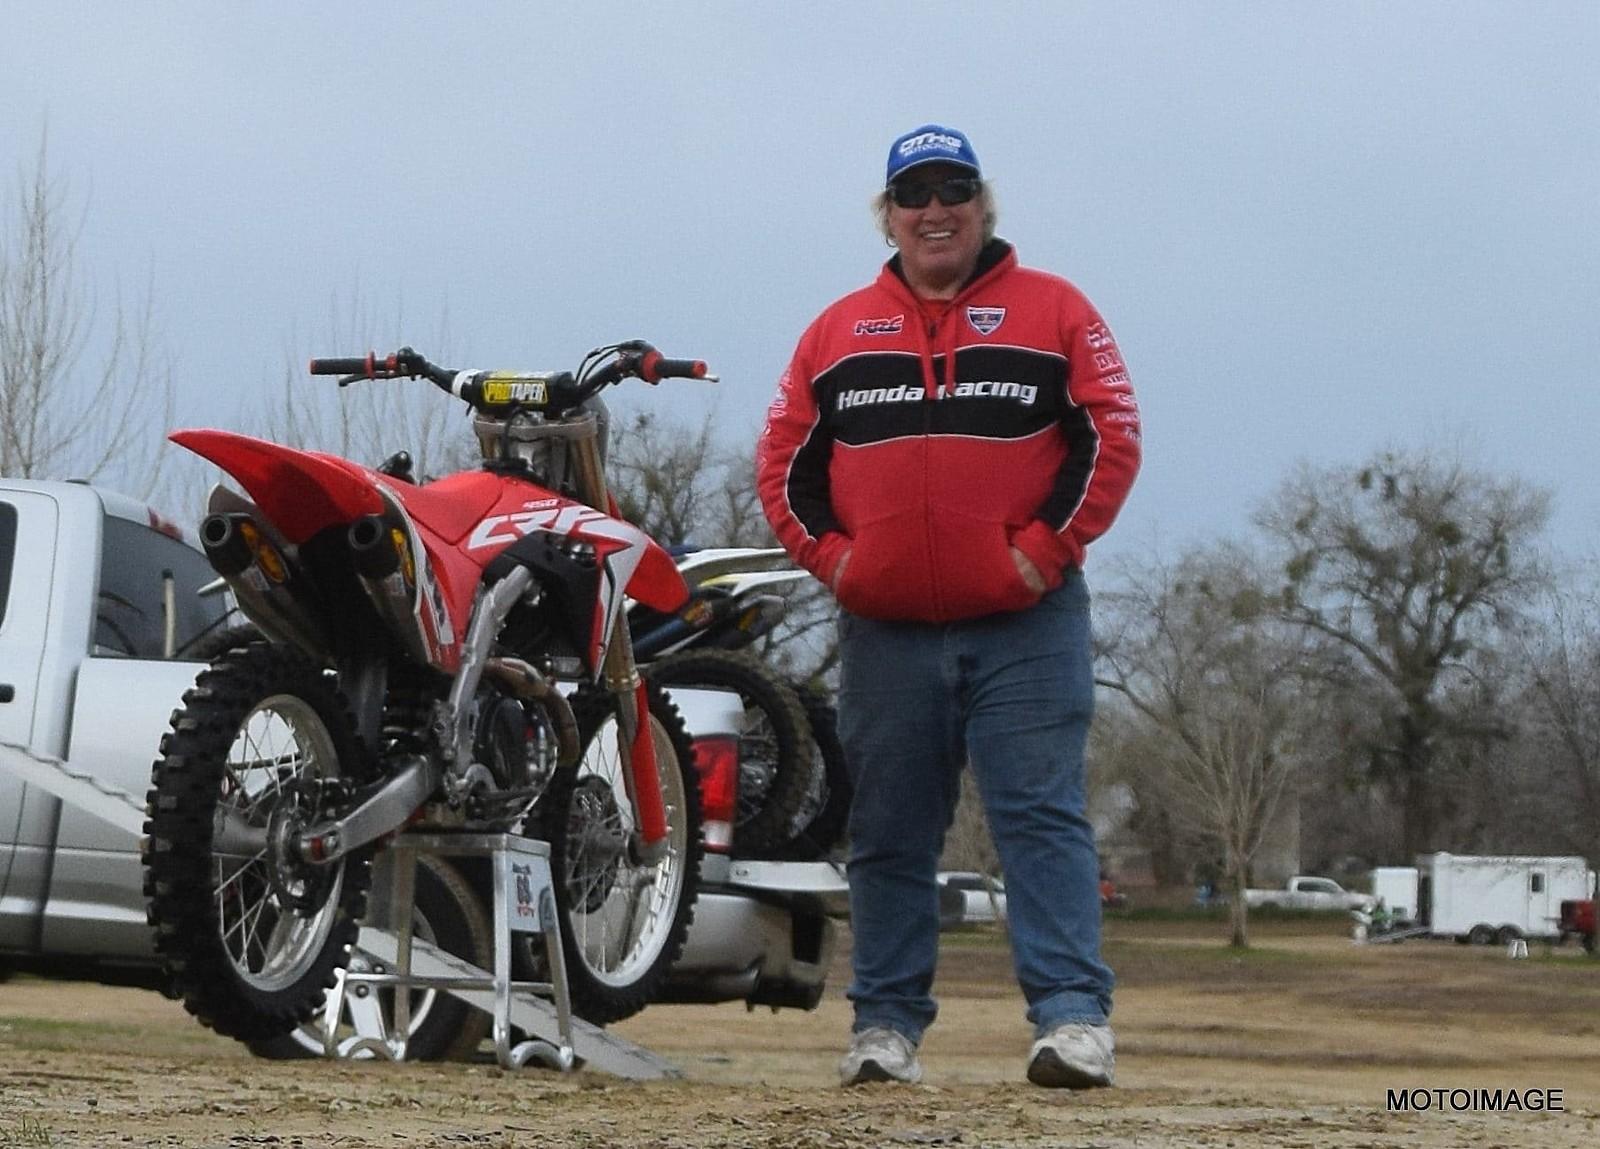 27265985 2038158726404268 1306615368 o - motokid40 - Motocross Pictures - Vital MX